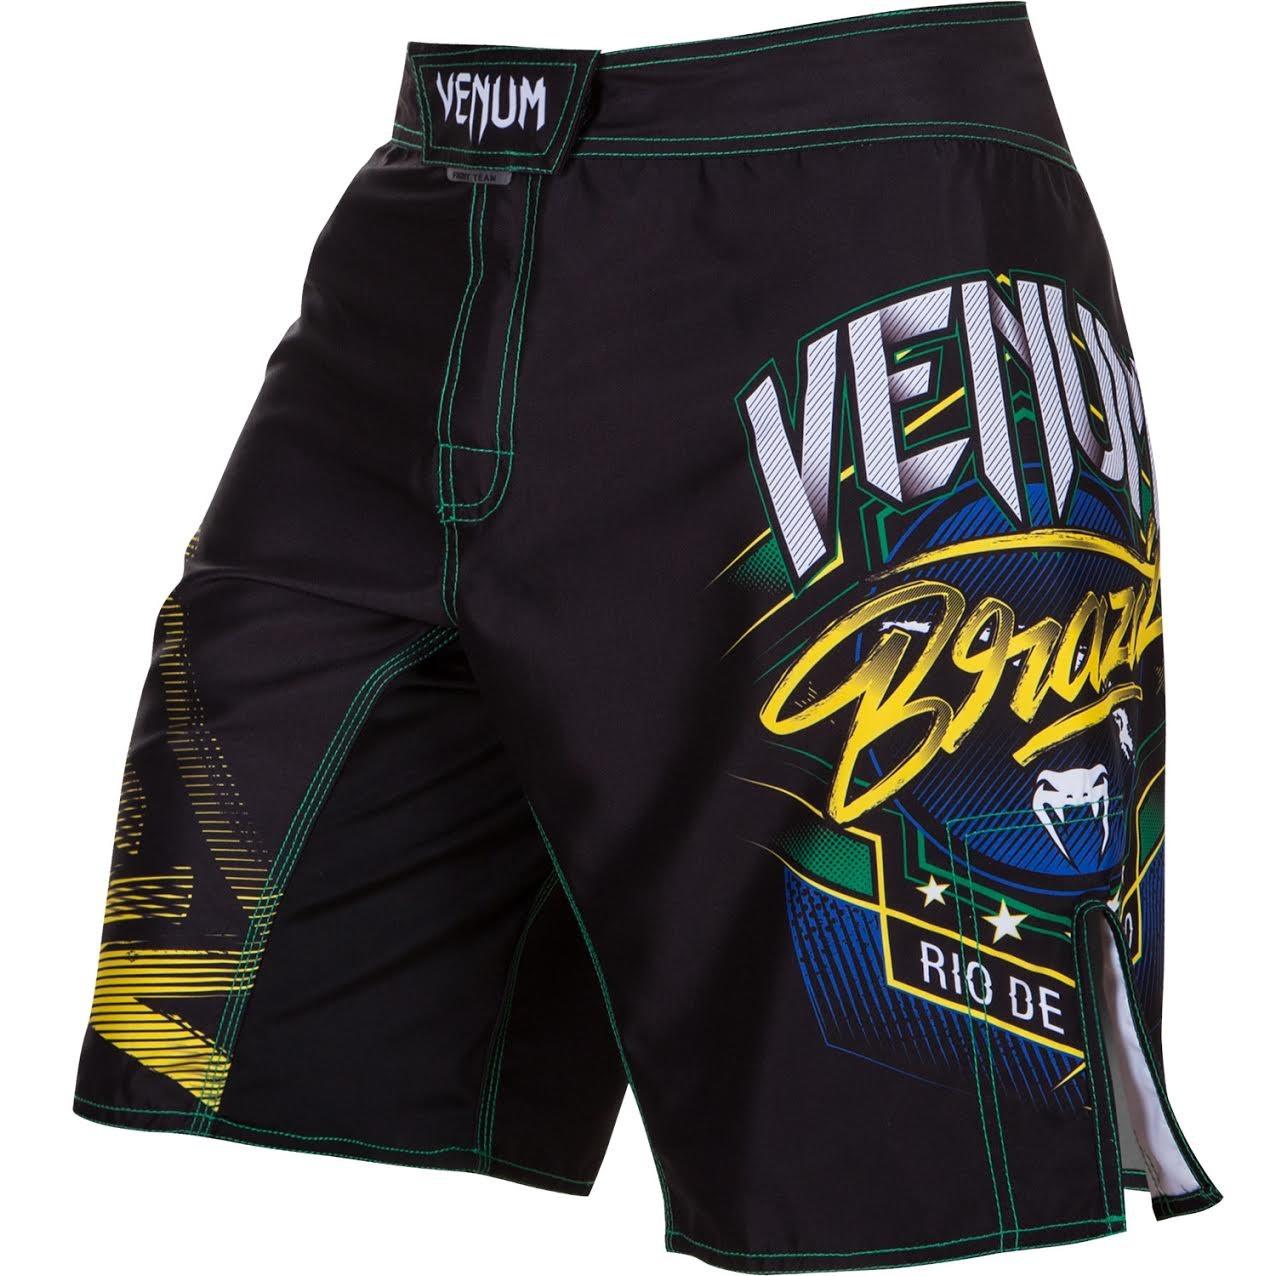 Шорты ММА Venum Carioca 3.0 Fight Shorts - Black<br>Вес кг: 0.00000000;